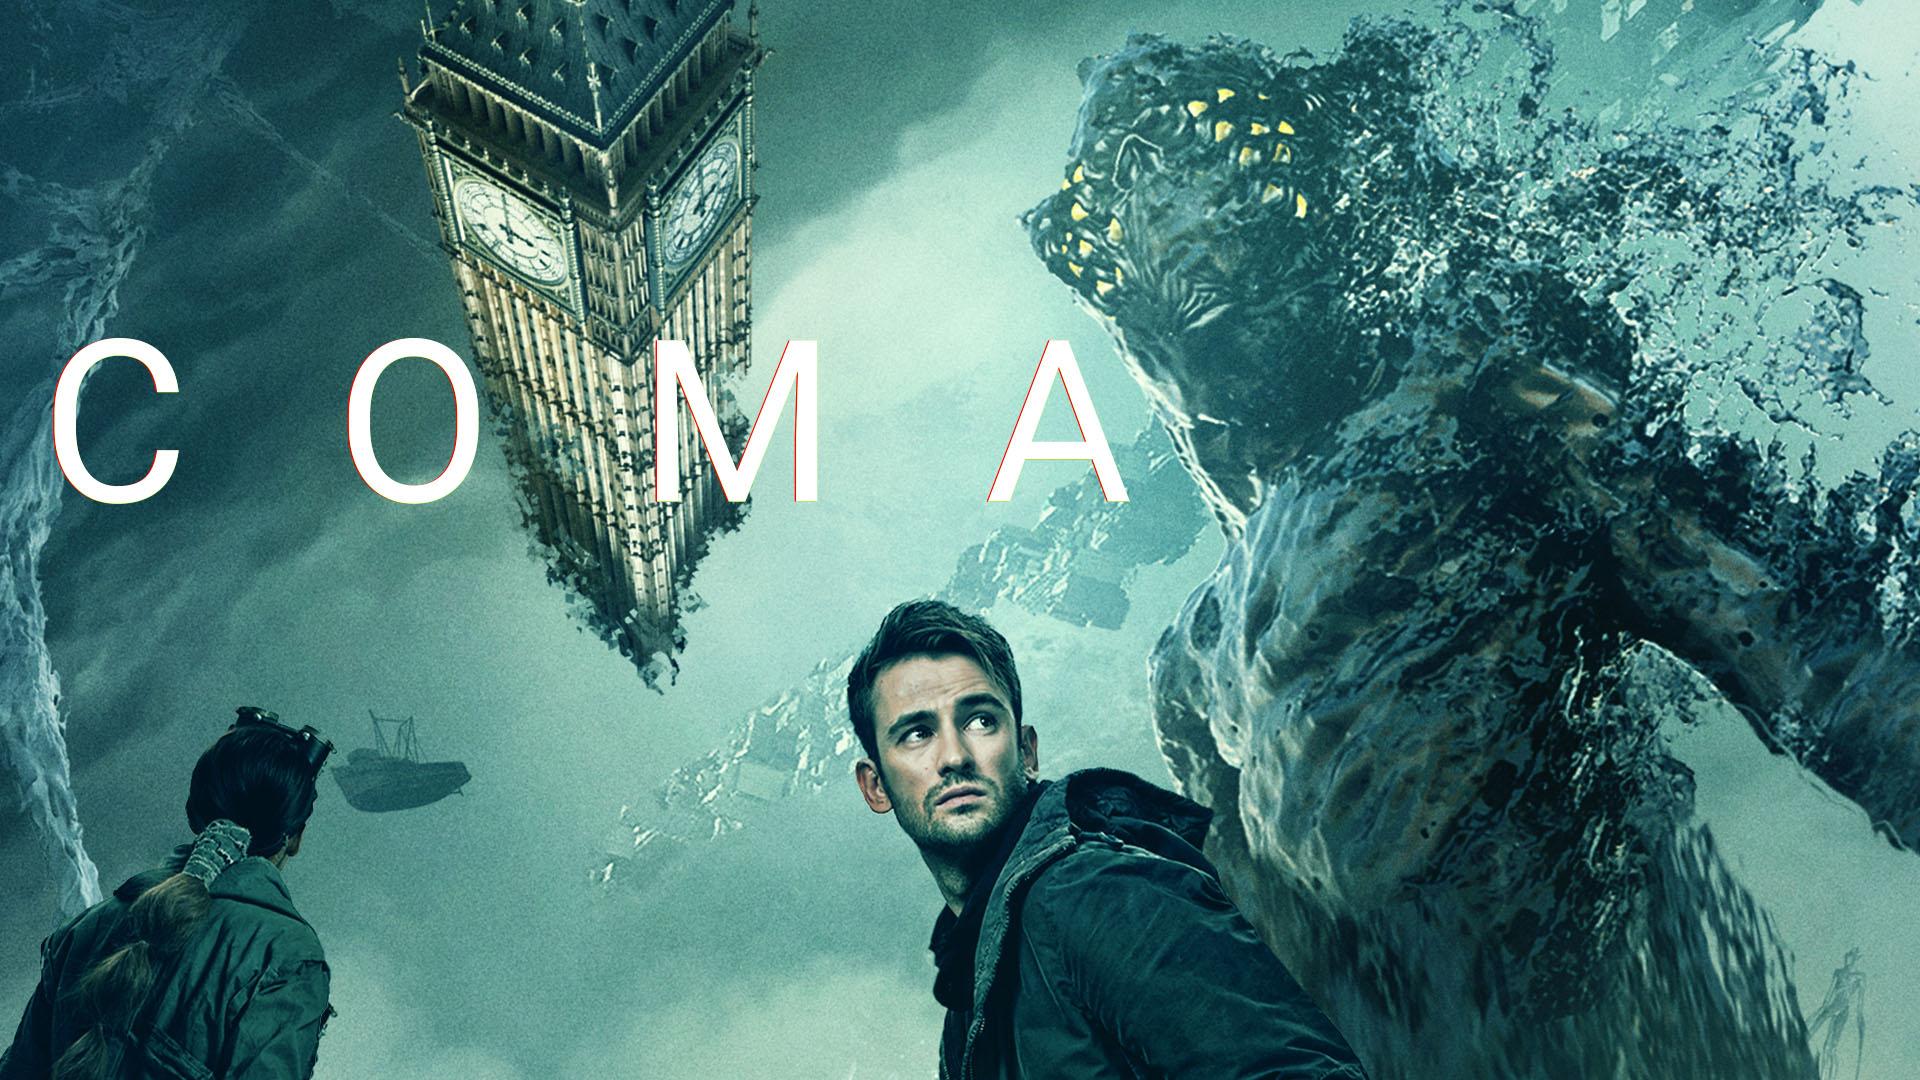 Coma (English dub)